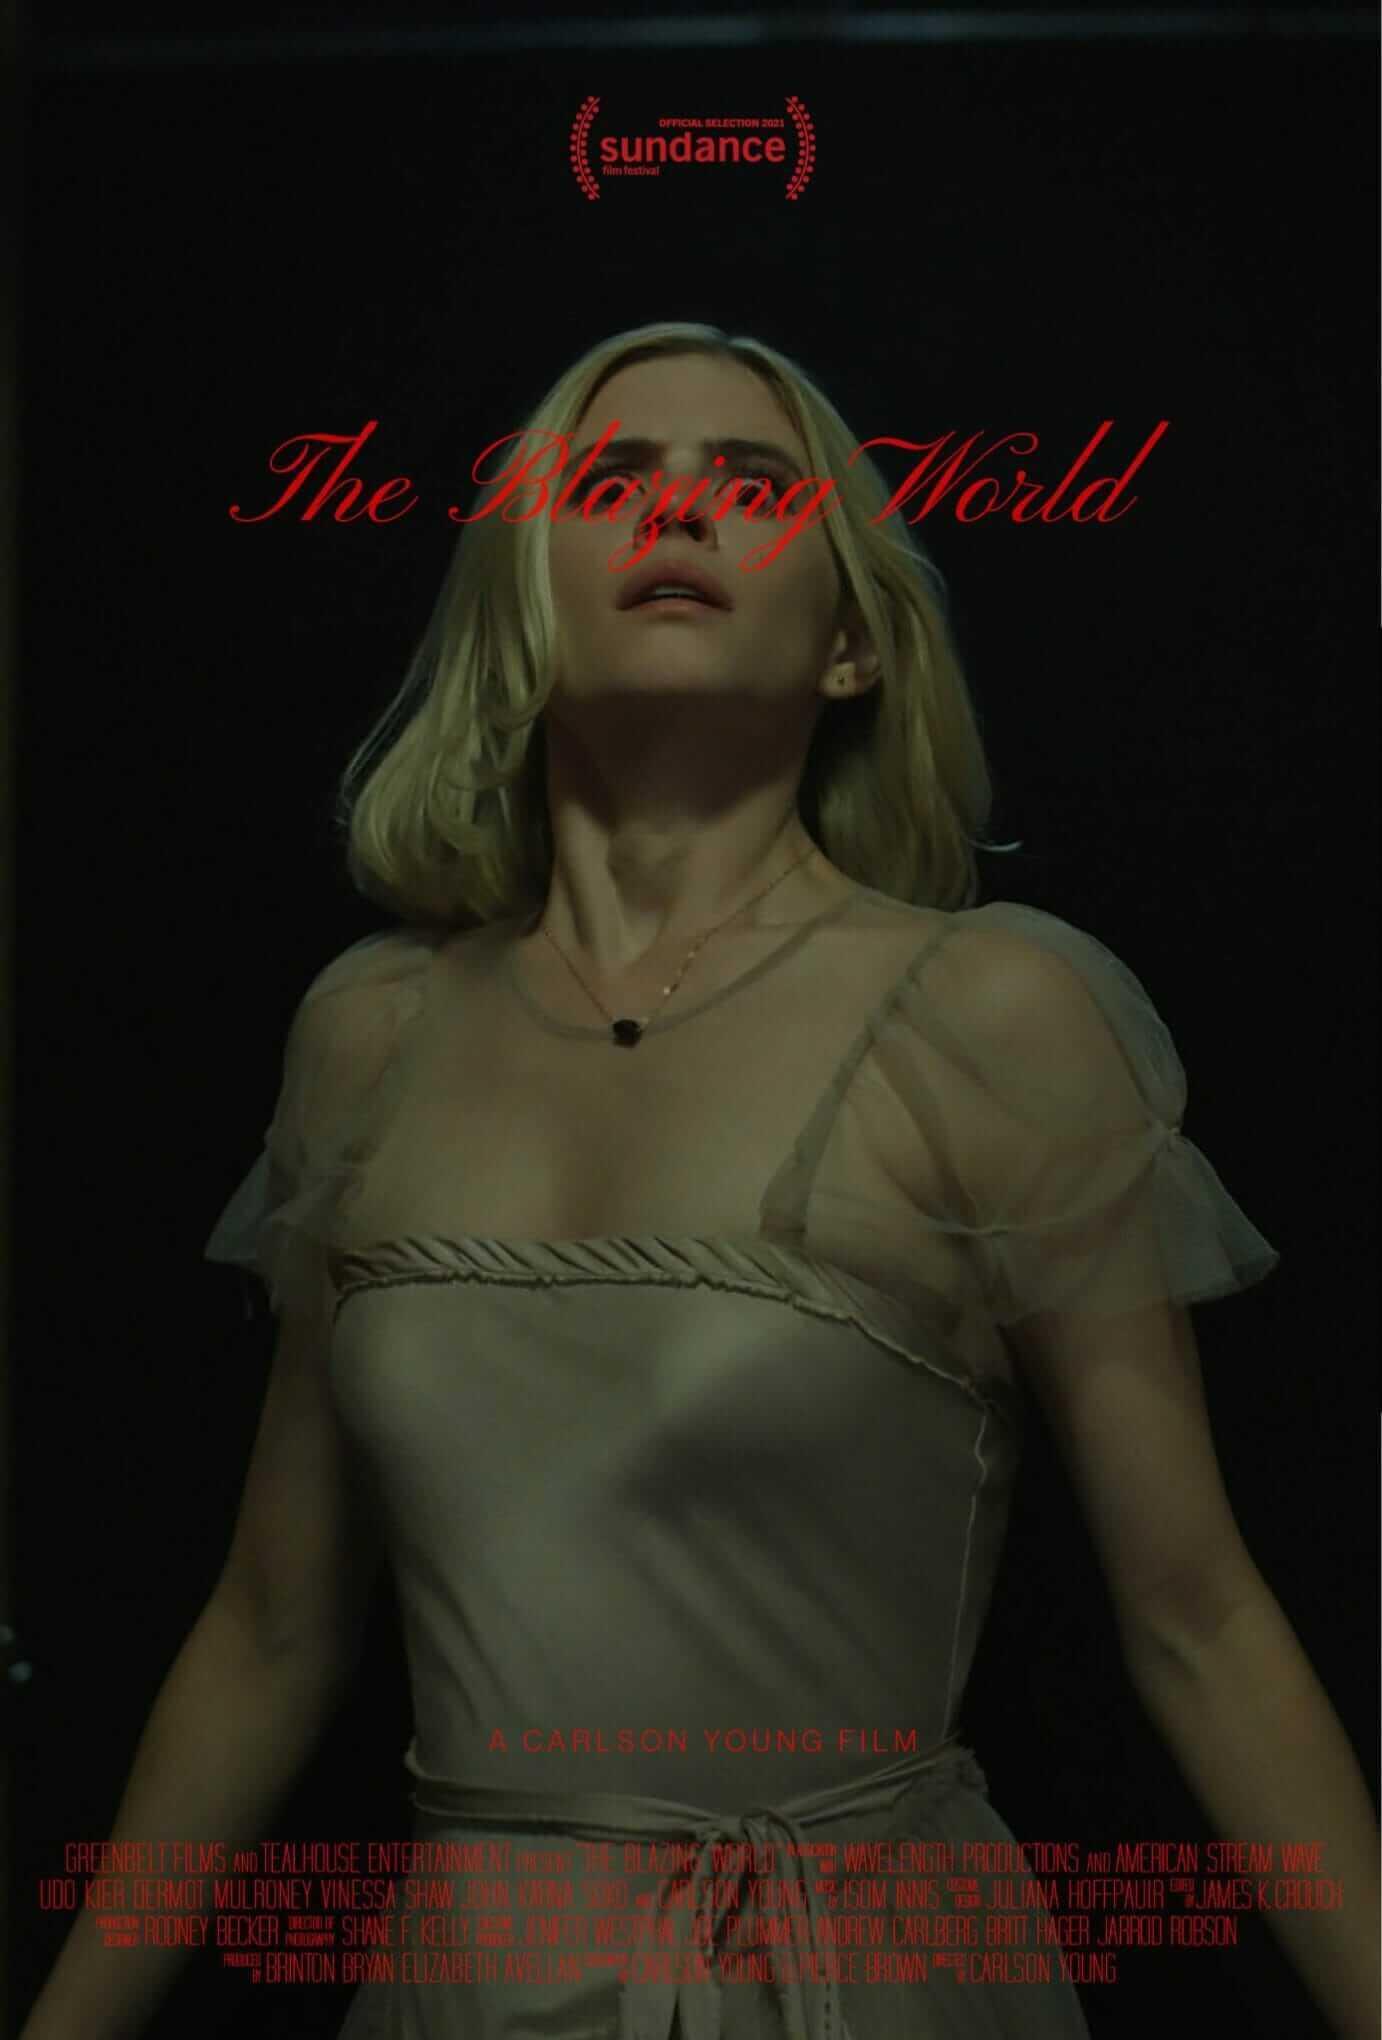 The Blazing World - Poster